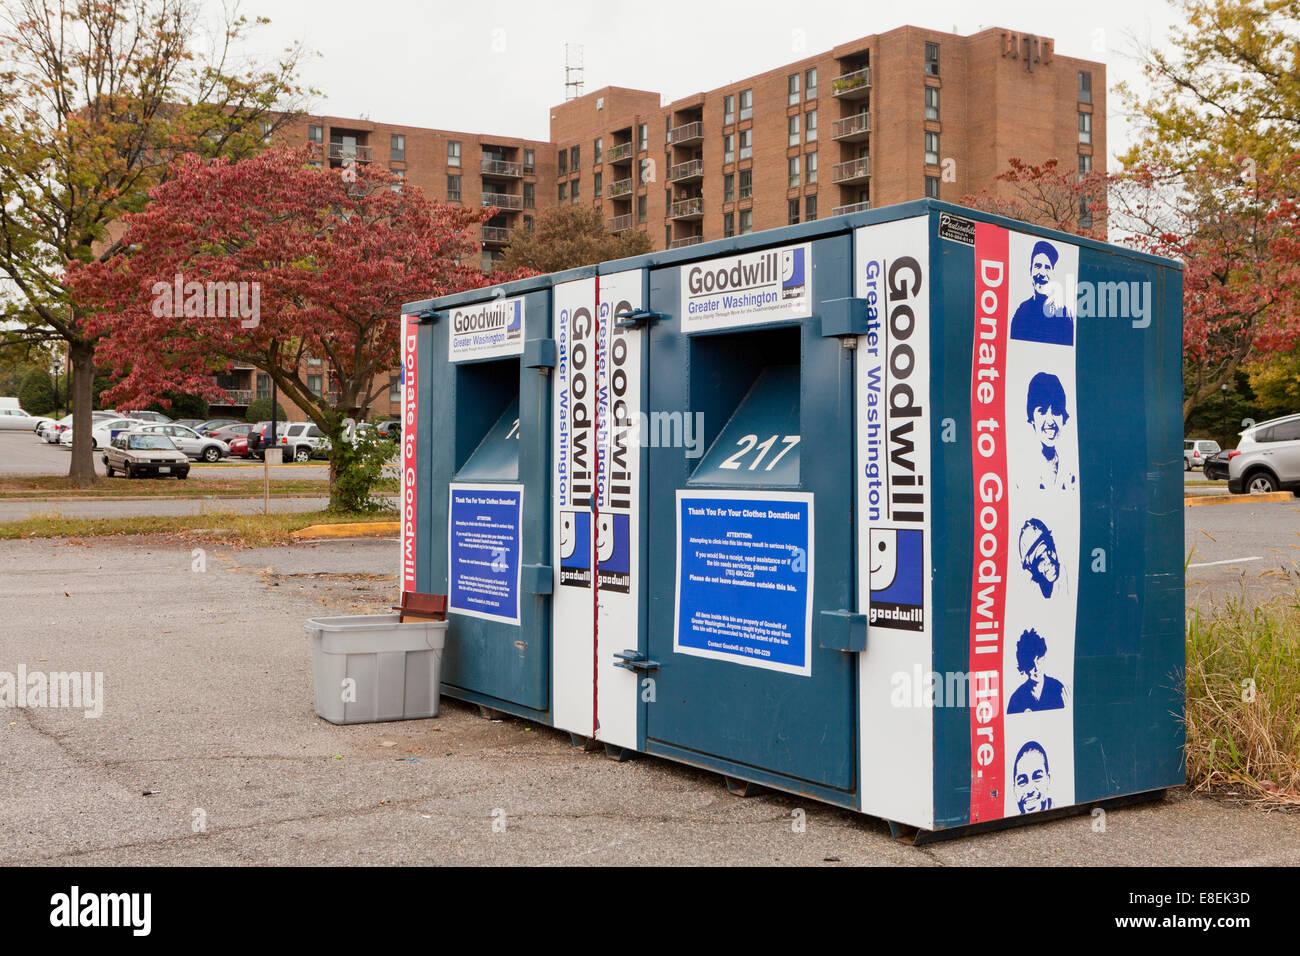 Goodwill used clothing bins - Virginia USA - Stock Image